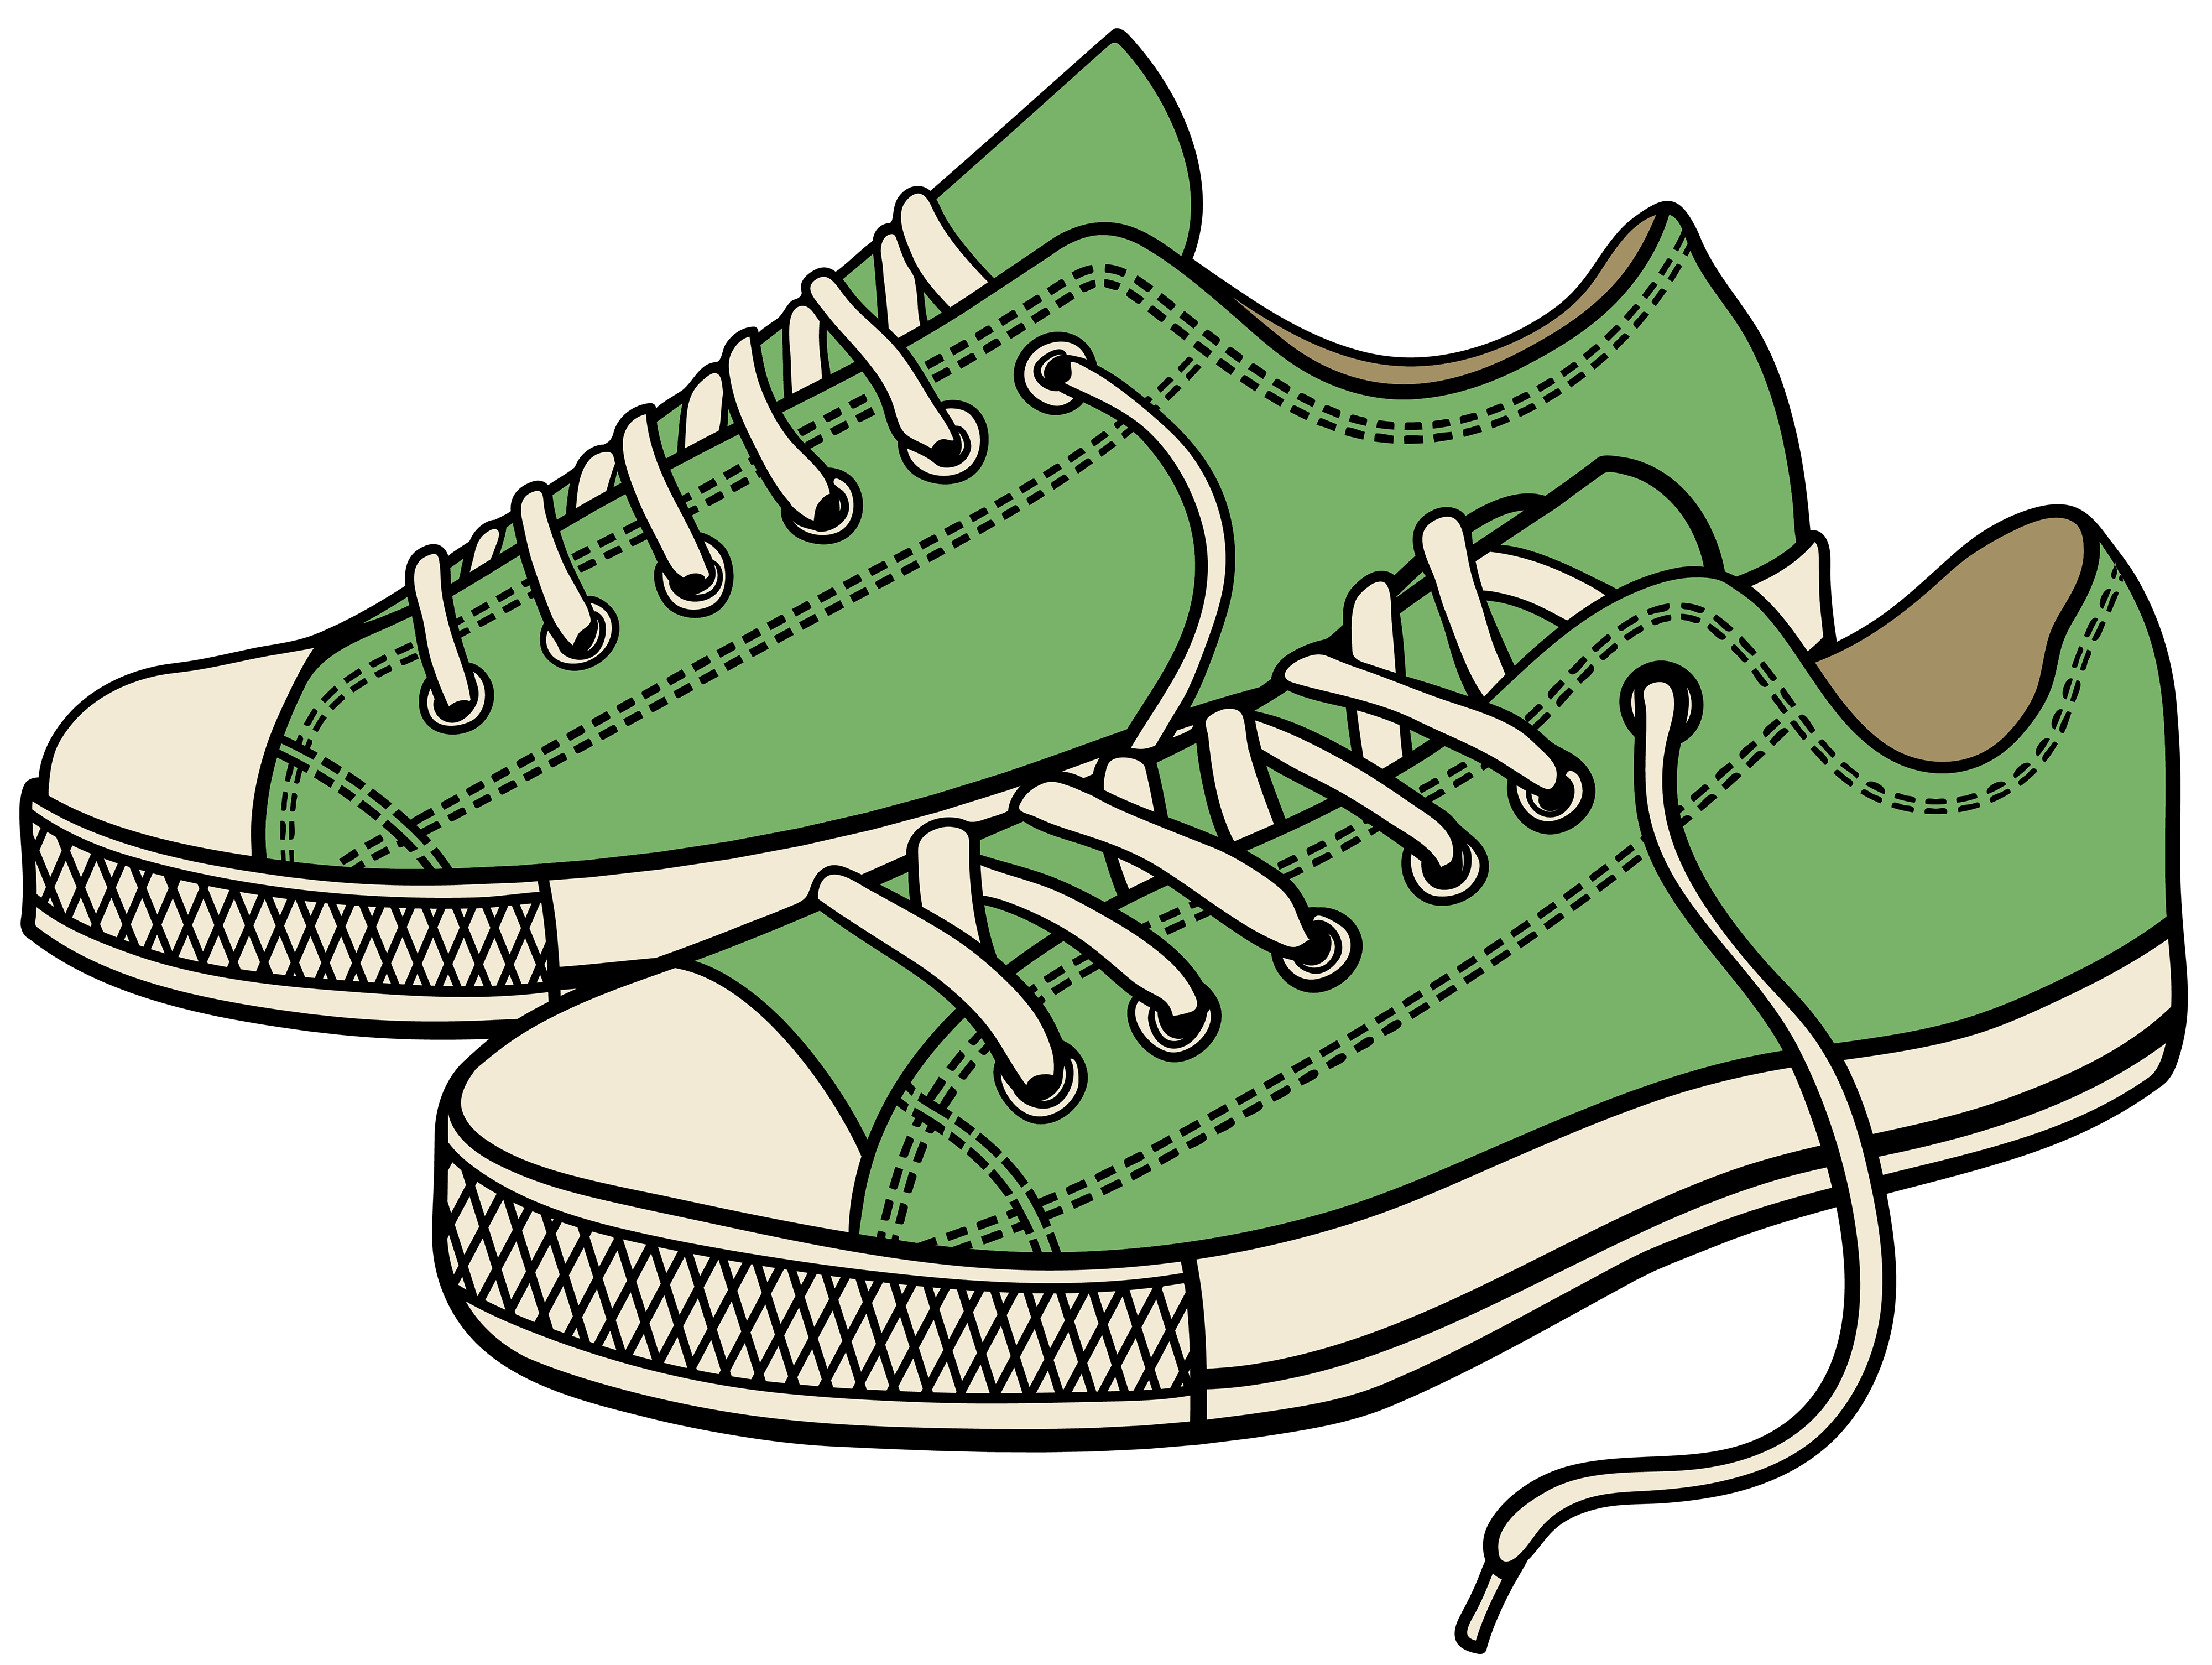 Running Shoe Clipart | Free download best Running Shoe ...